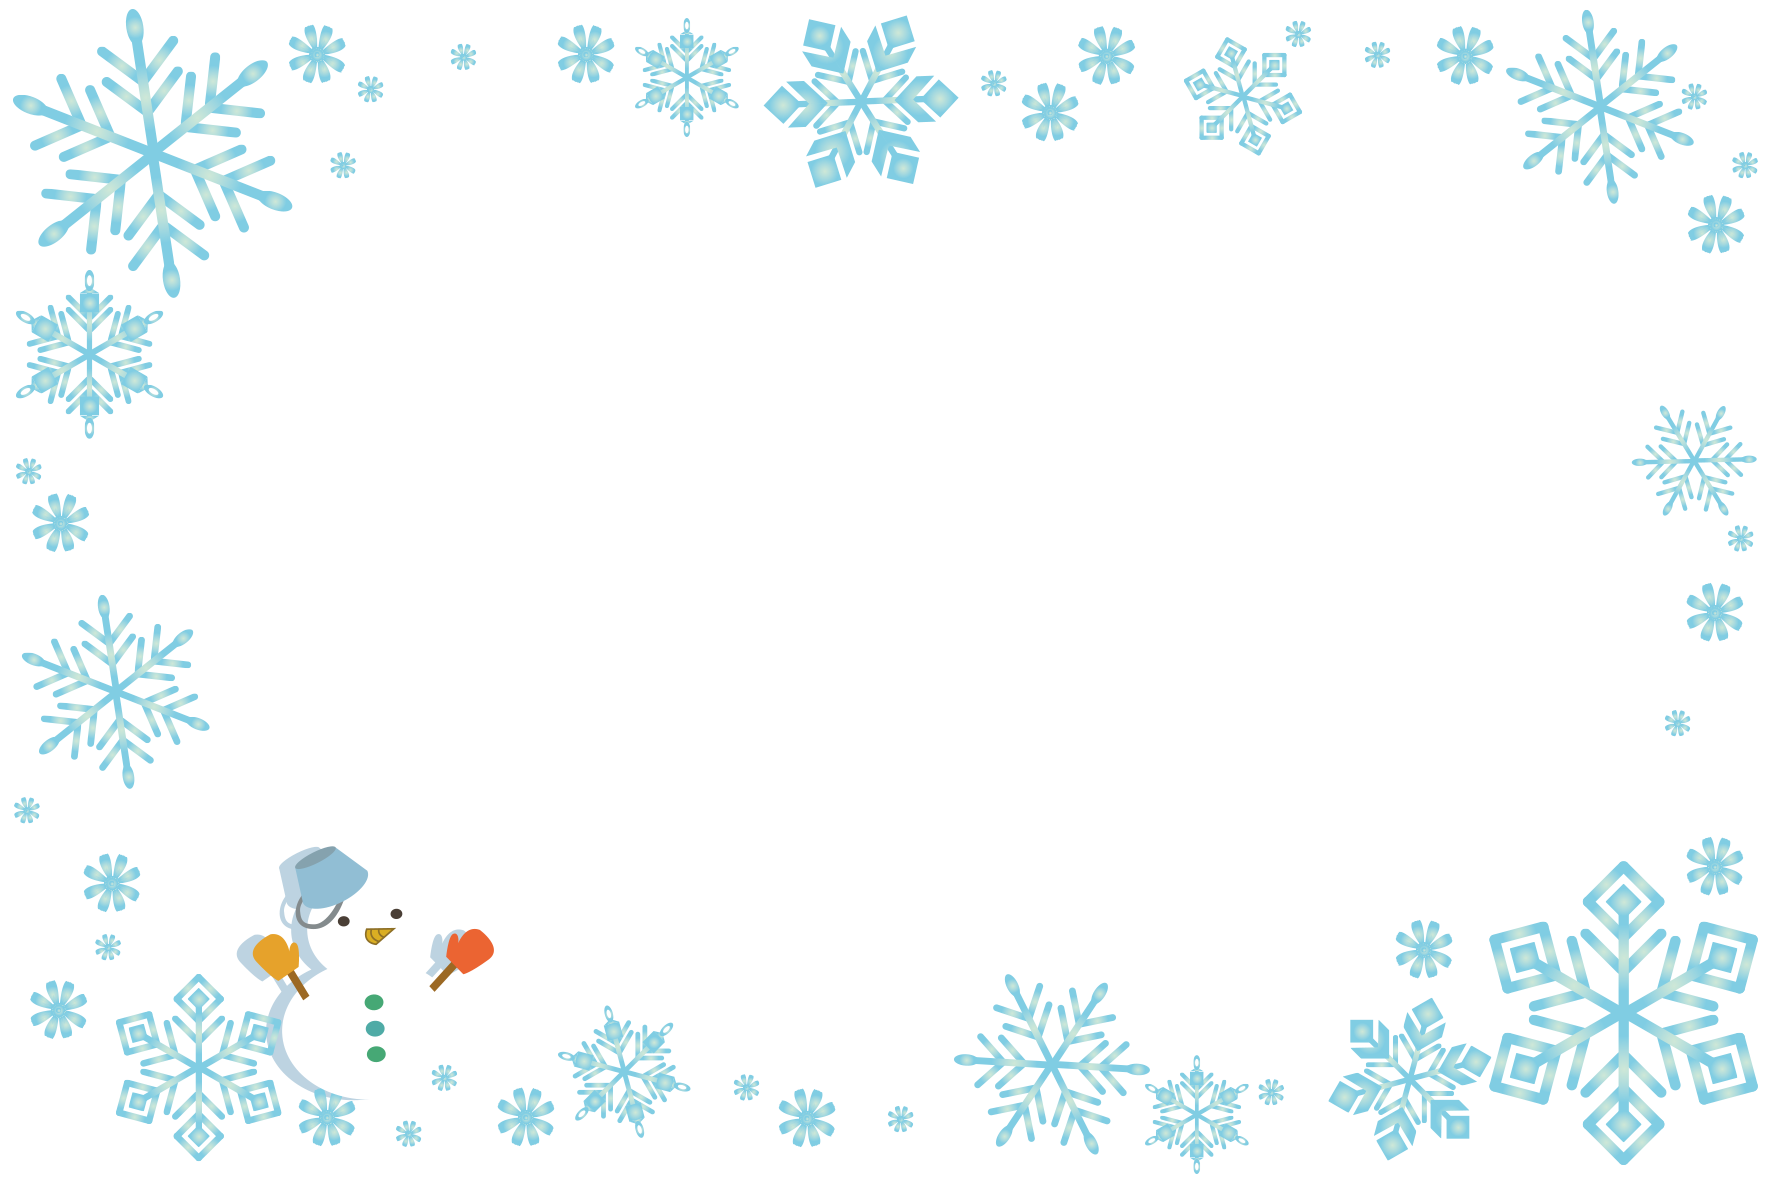 Http Www Illust Ai Com Single Php C 結晶 手作りグリーティングカード 雪の結晶 イラスト